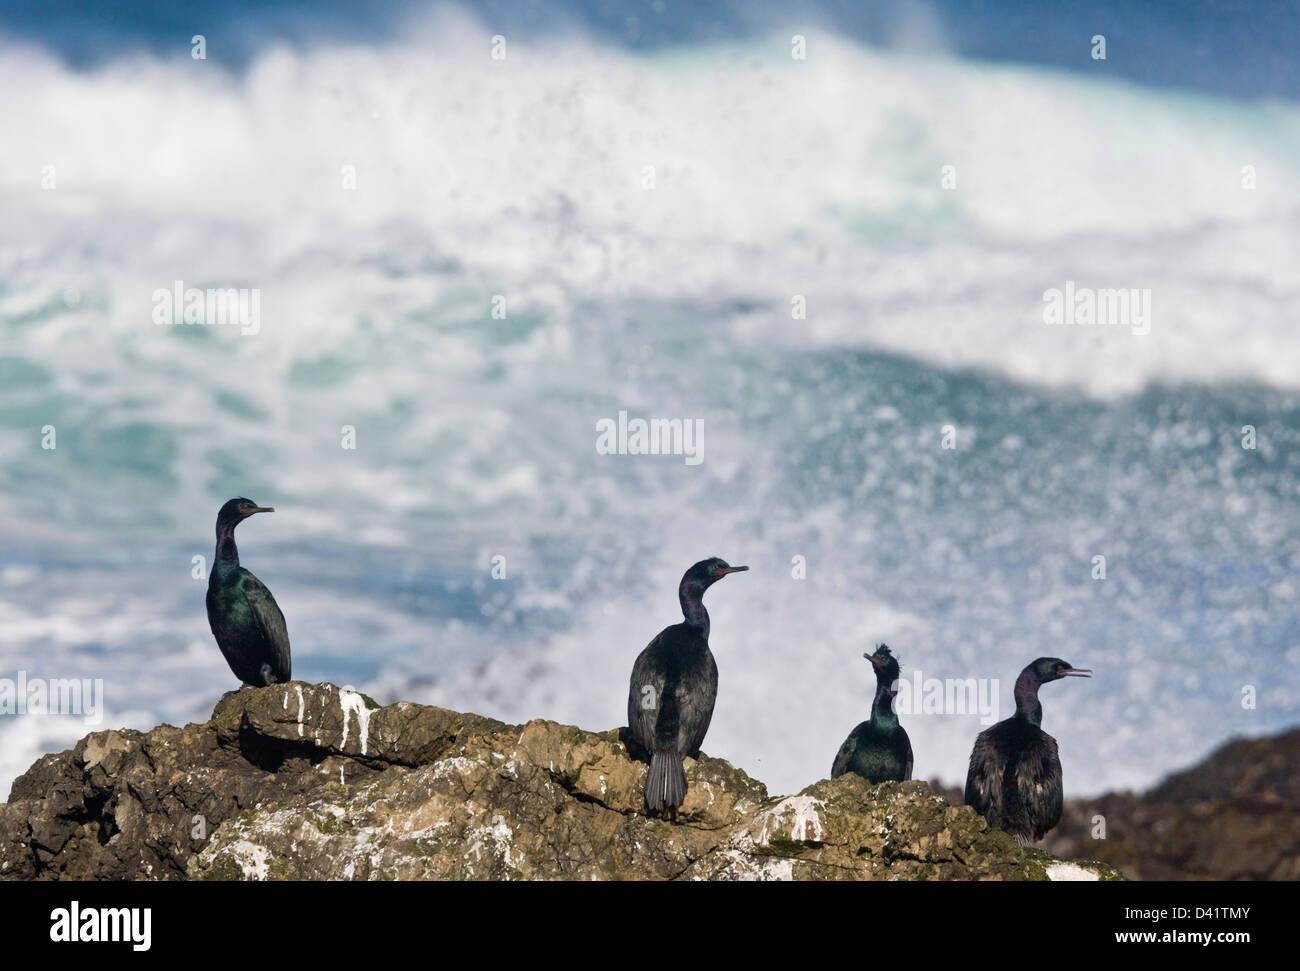 Pelagic Cormorants (Phalacrocorax pelagicus) on rocks by the sea, North California coast at MacKerricher State Park, - Stock Image